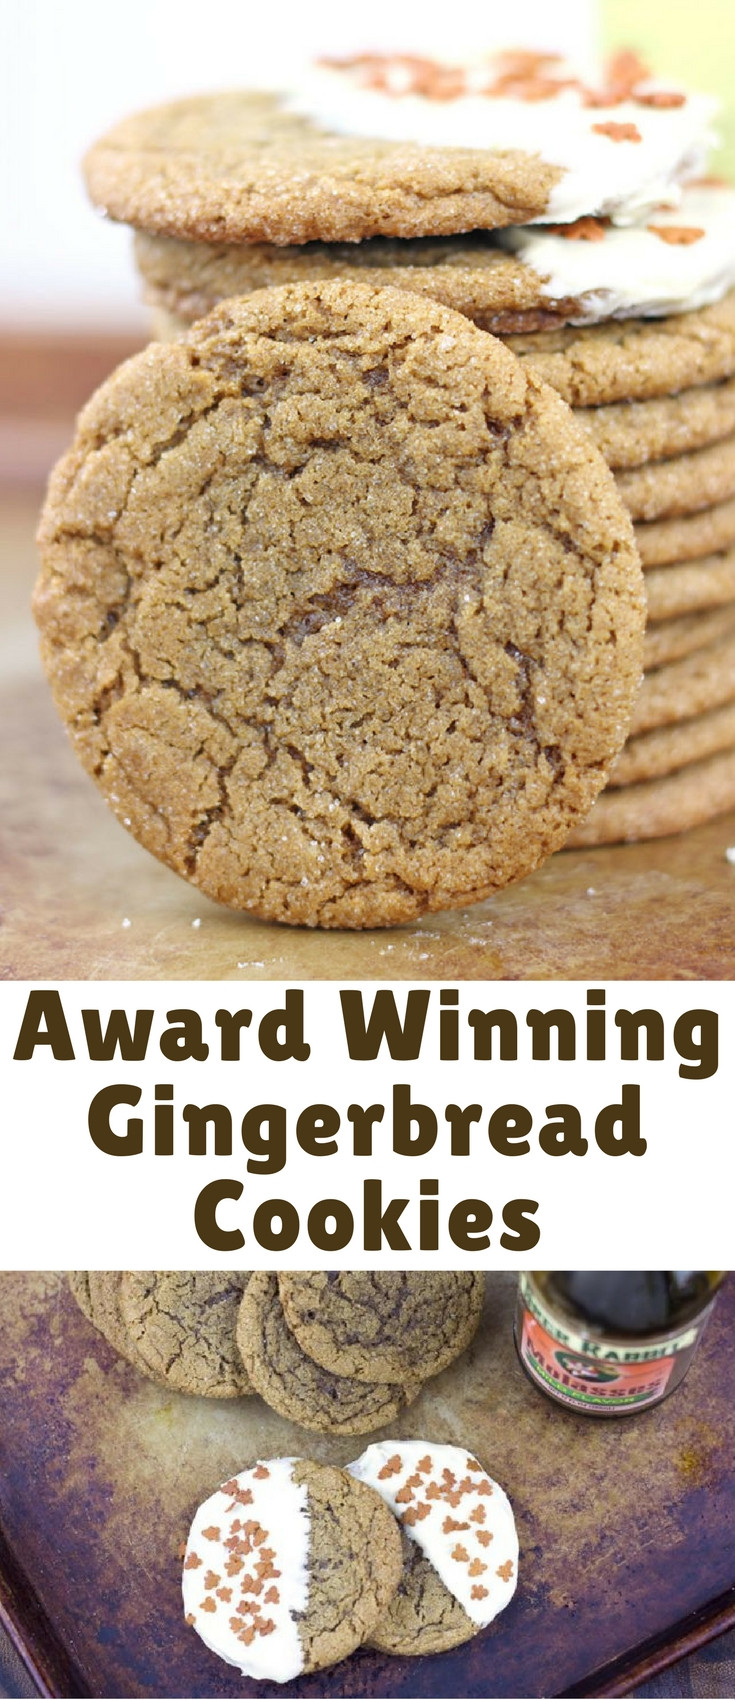 Award Winning Christmas Cookies  Award Winning Gingerbread Cookies Blogger Bests